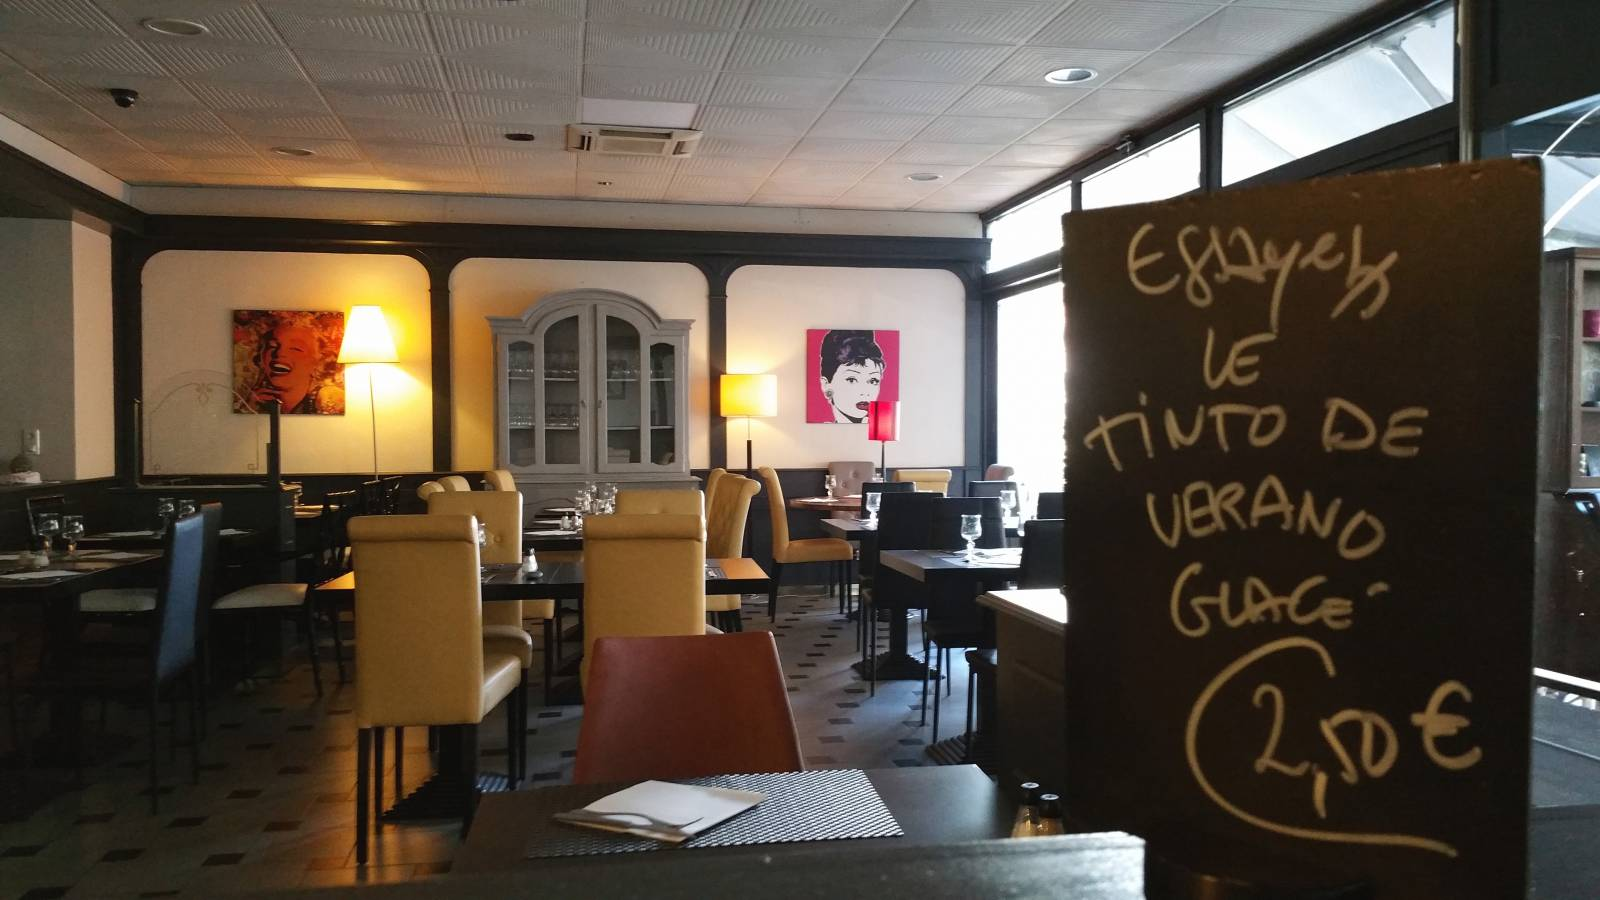 Location de salle et banquet restaurant cuisine du sud for Equipement salle restaurant